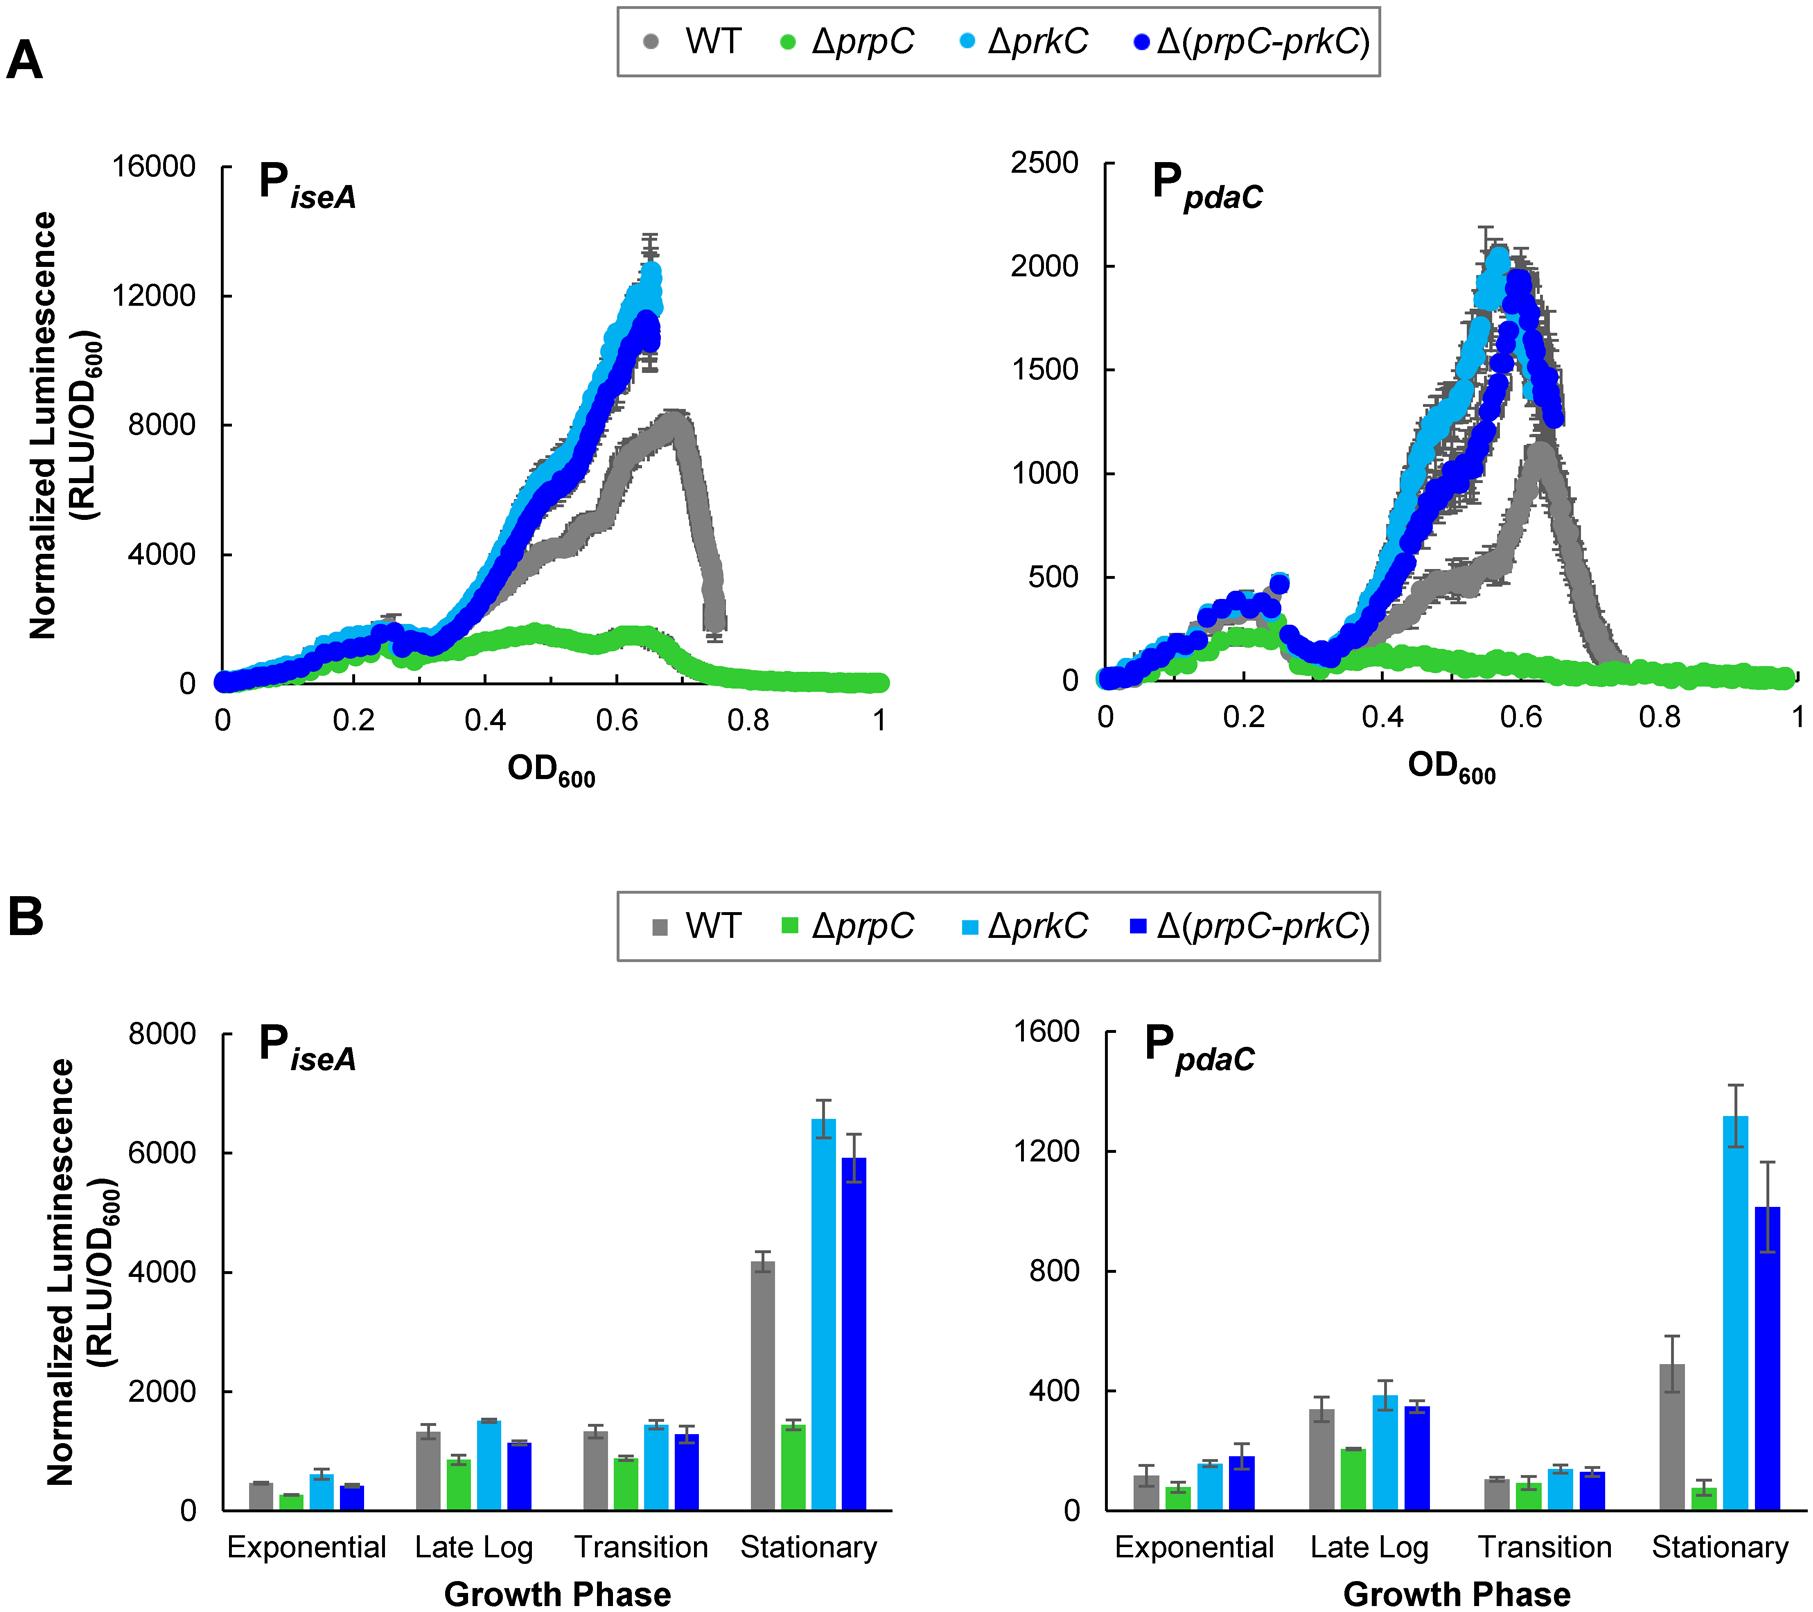 The PrkC kinase and the PrpC phosphatase regulate the WalR regulon genes <i>iseA</i> and <i>pdaC</i>.